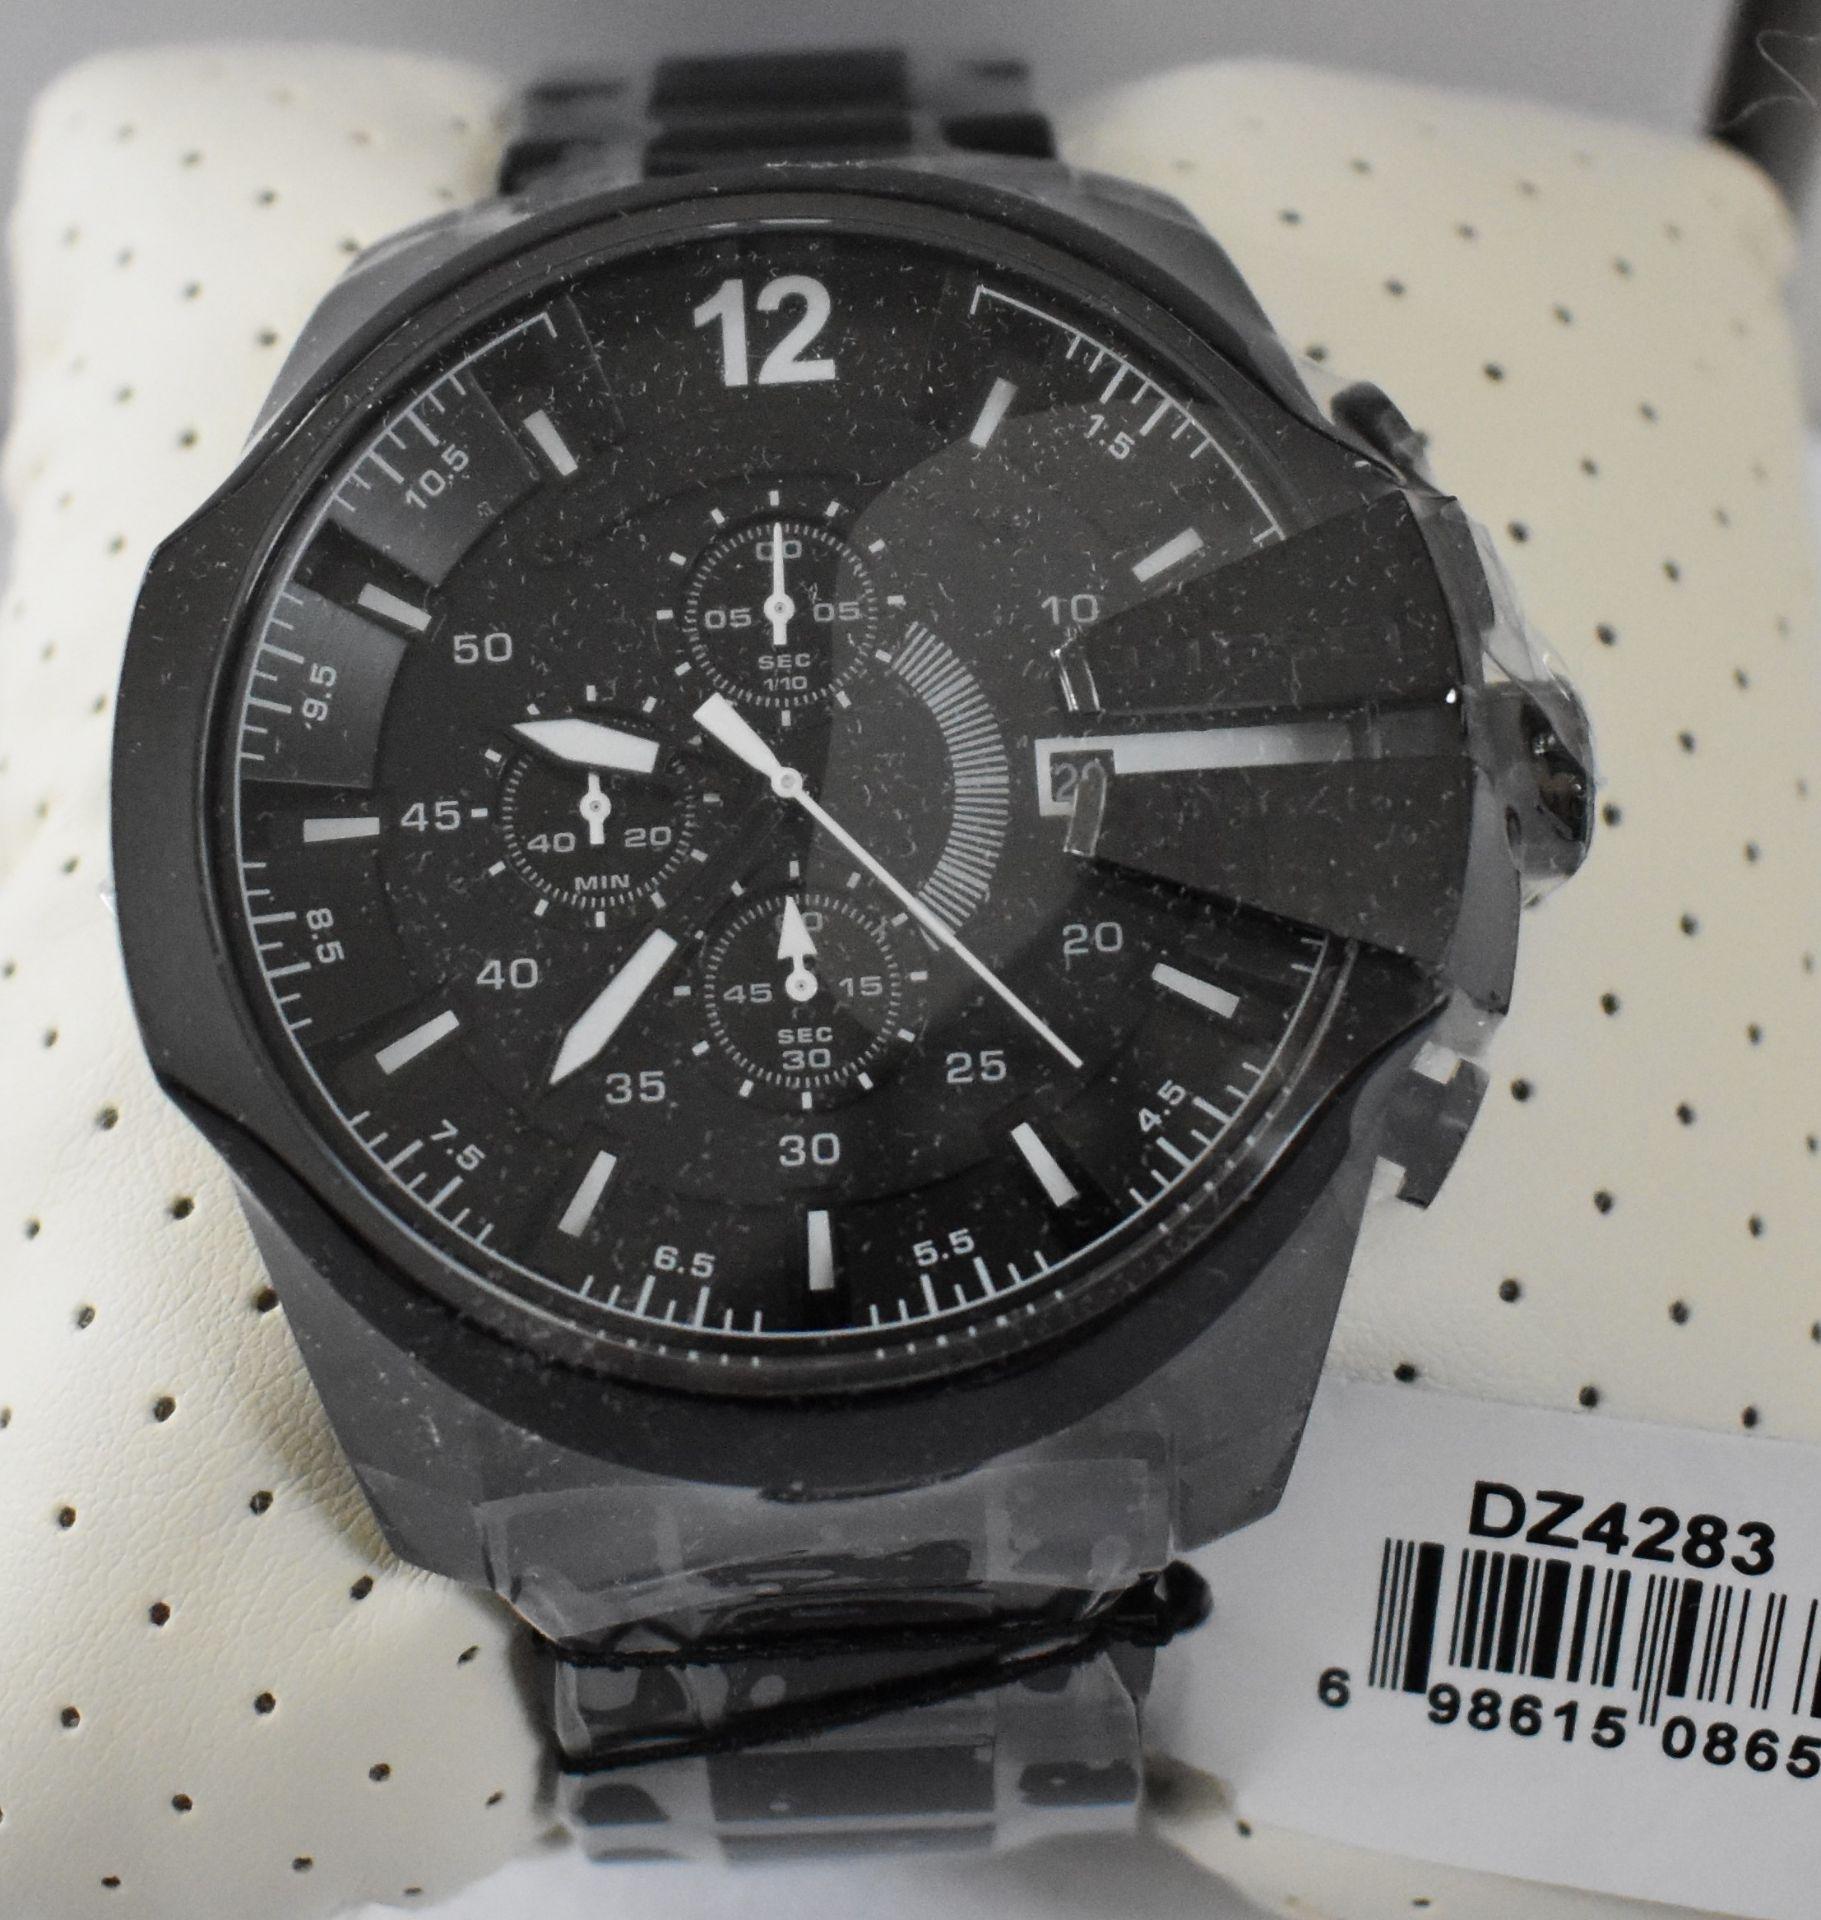 Diesel Men's Watch DZ4283 - Image 2 of 3